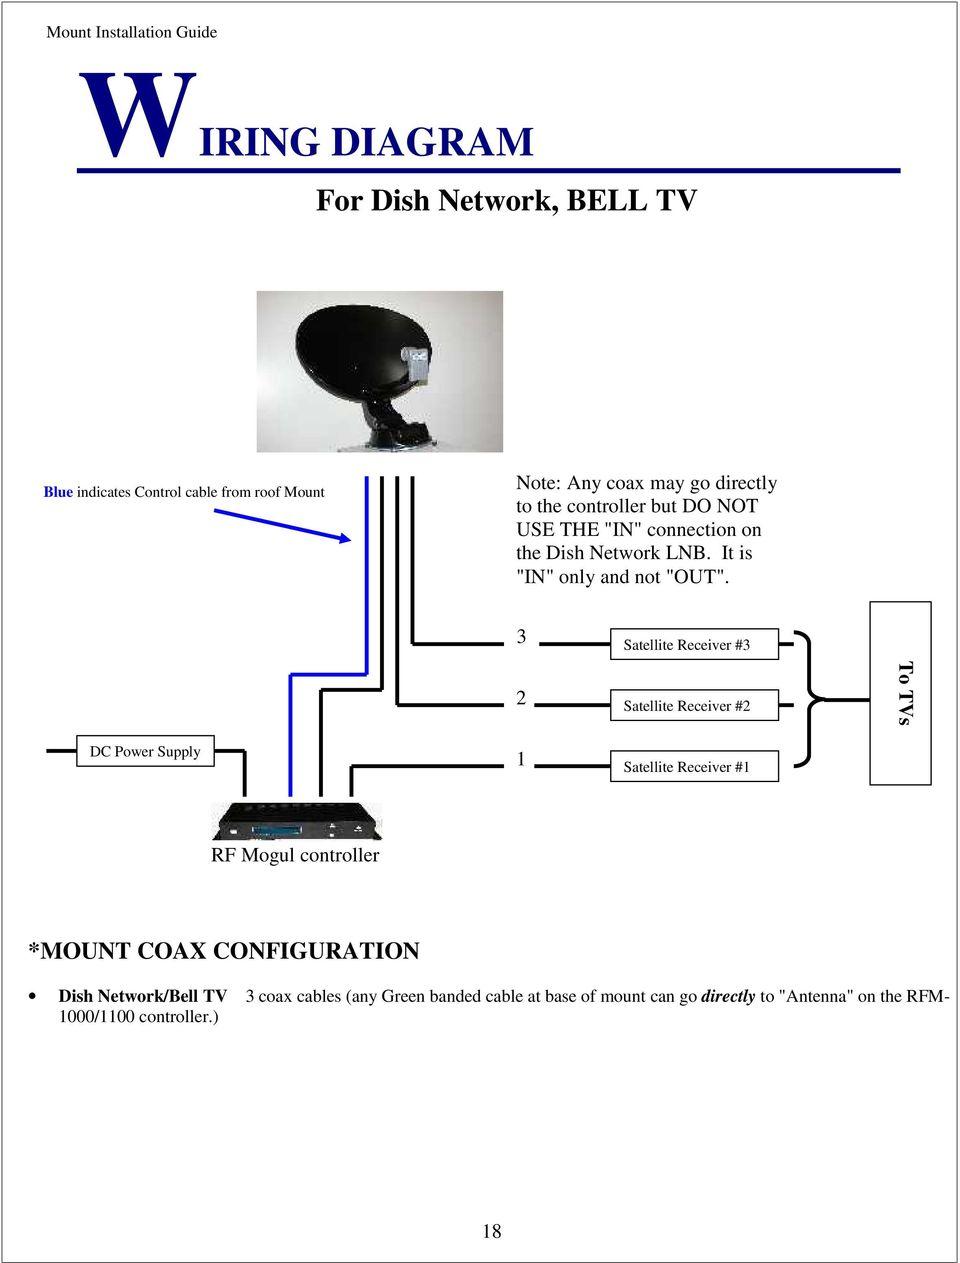 hight resolution of 3 2 satellite receiver 3 satellite receiver 2 to tvs dc power supply 1 19 wiring diagram